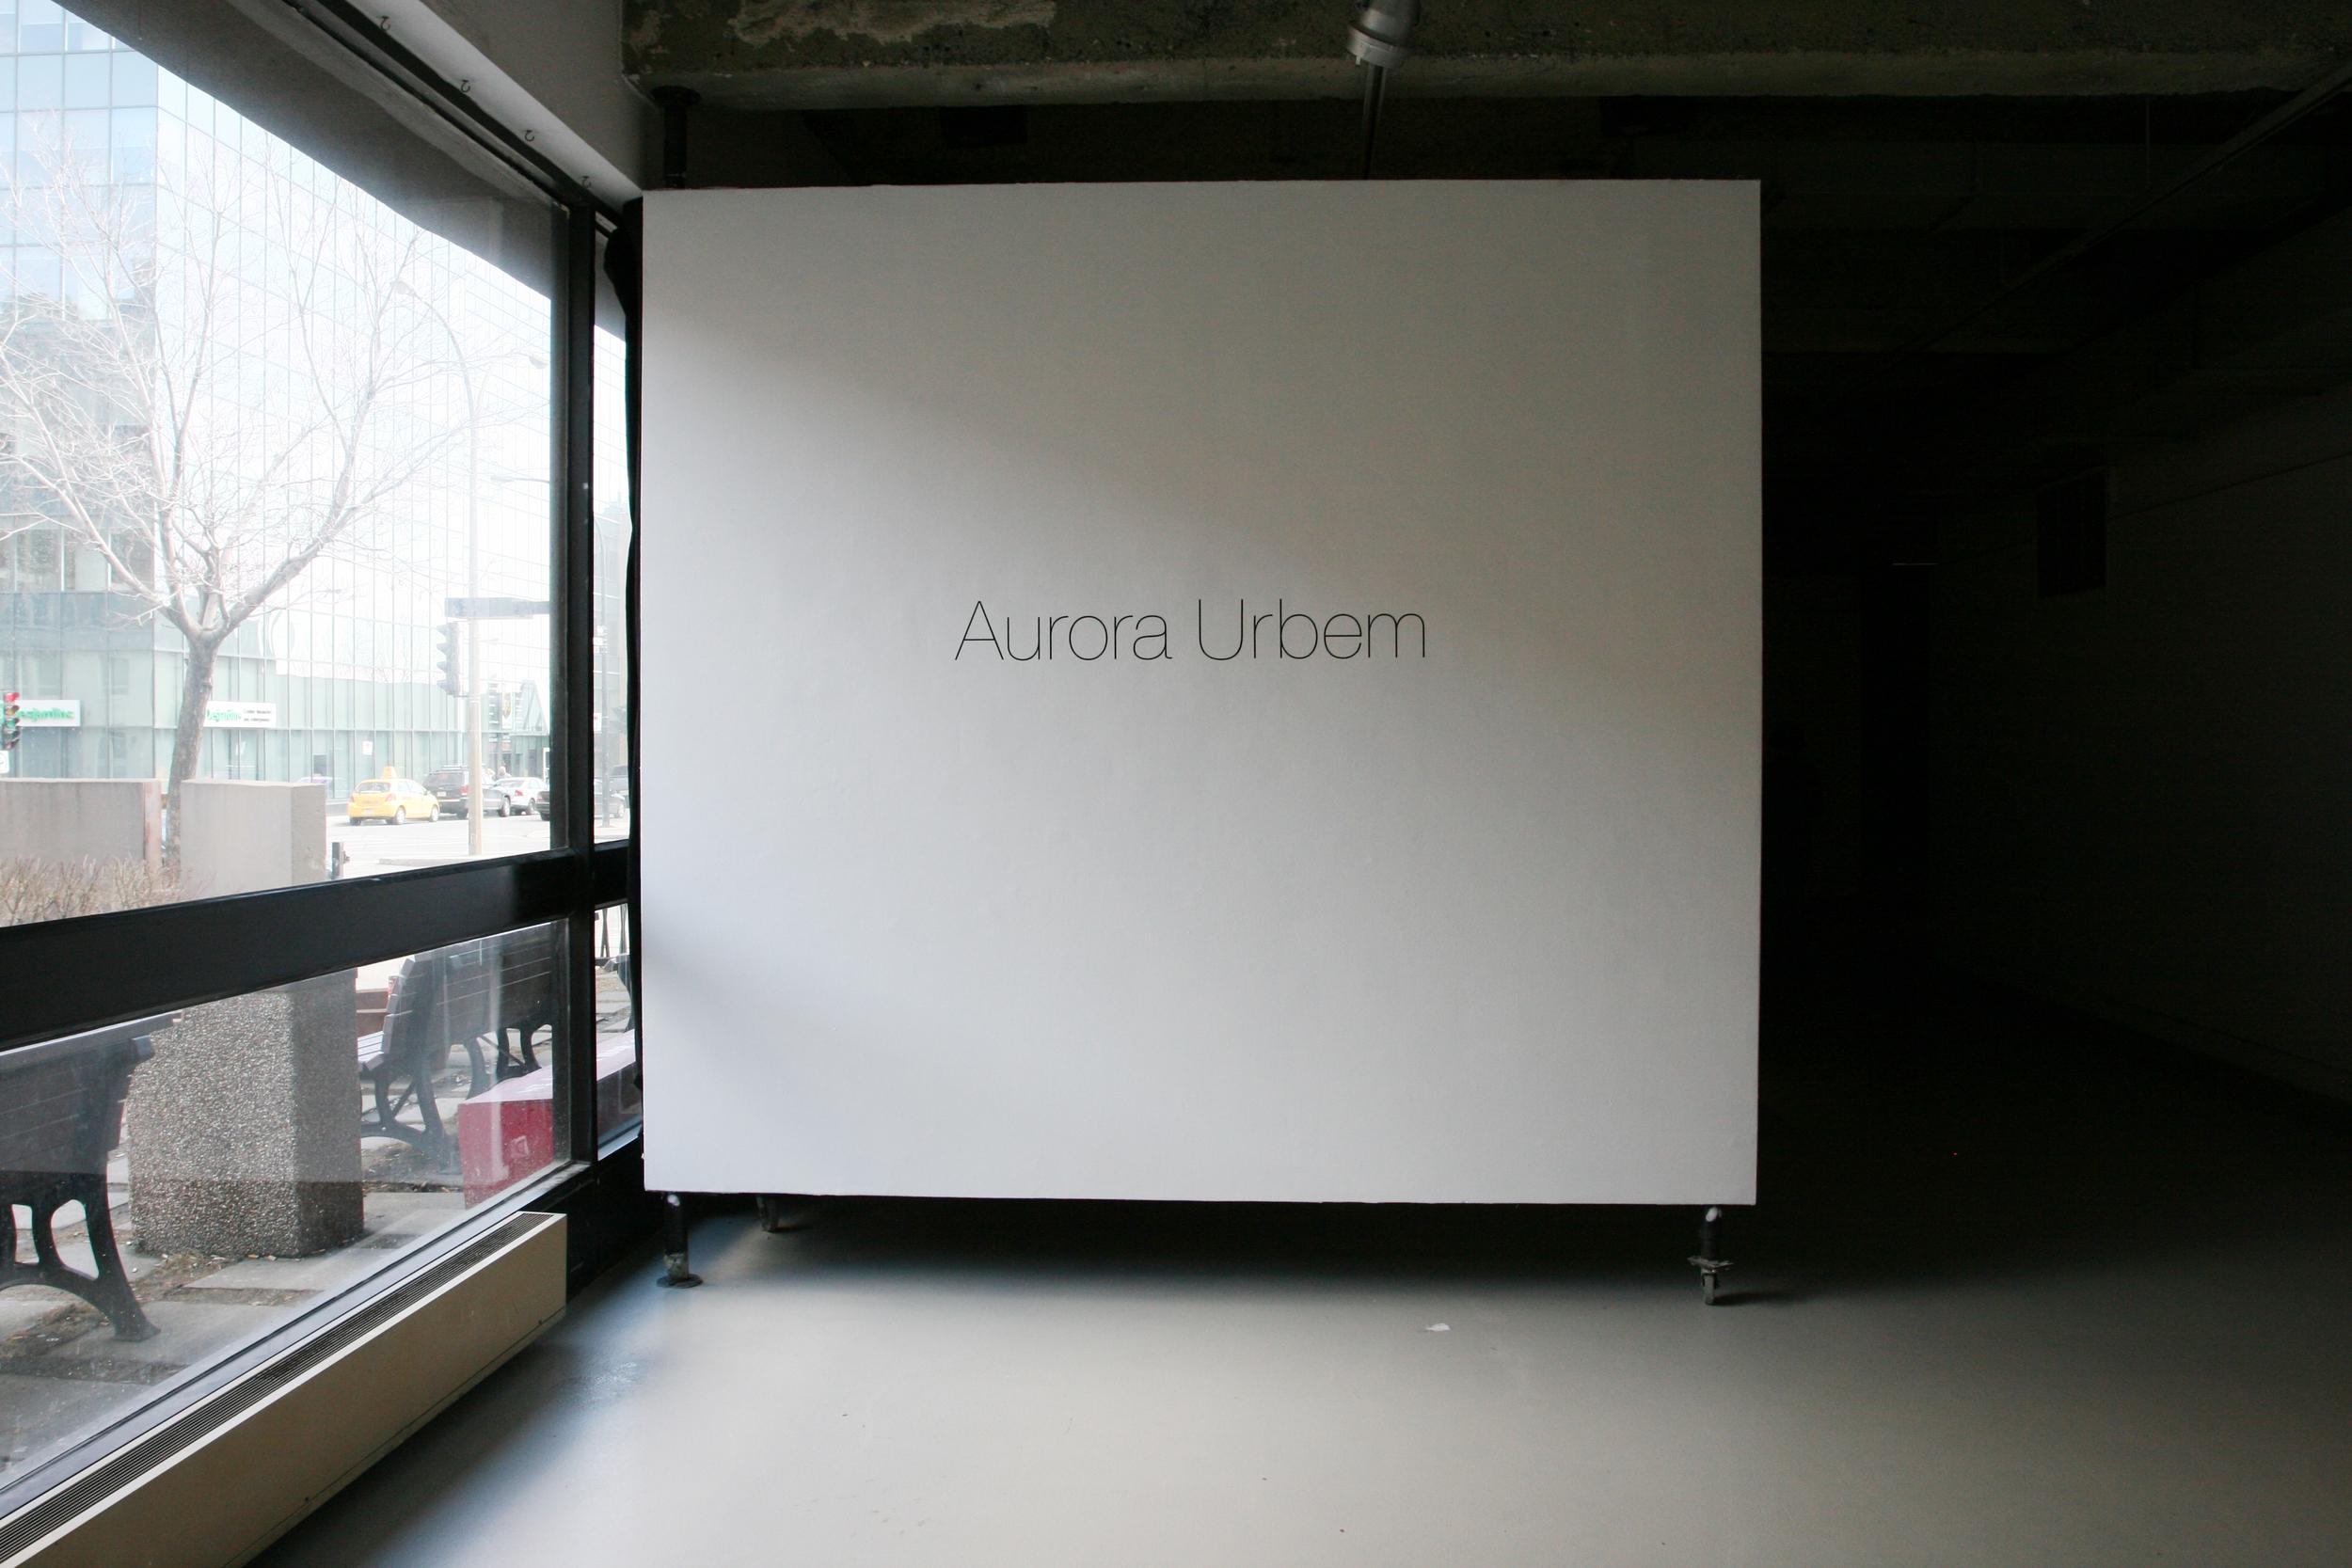 Aurora_Select_0002.jpg